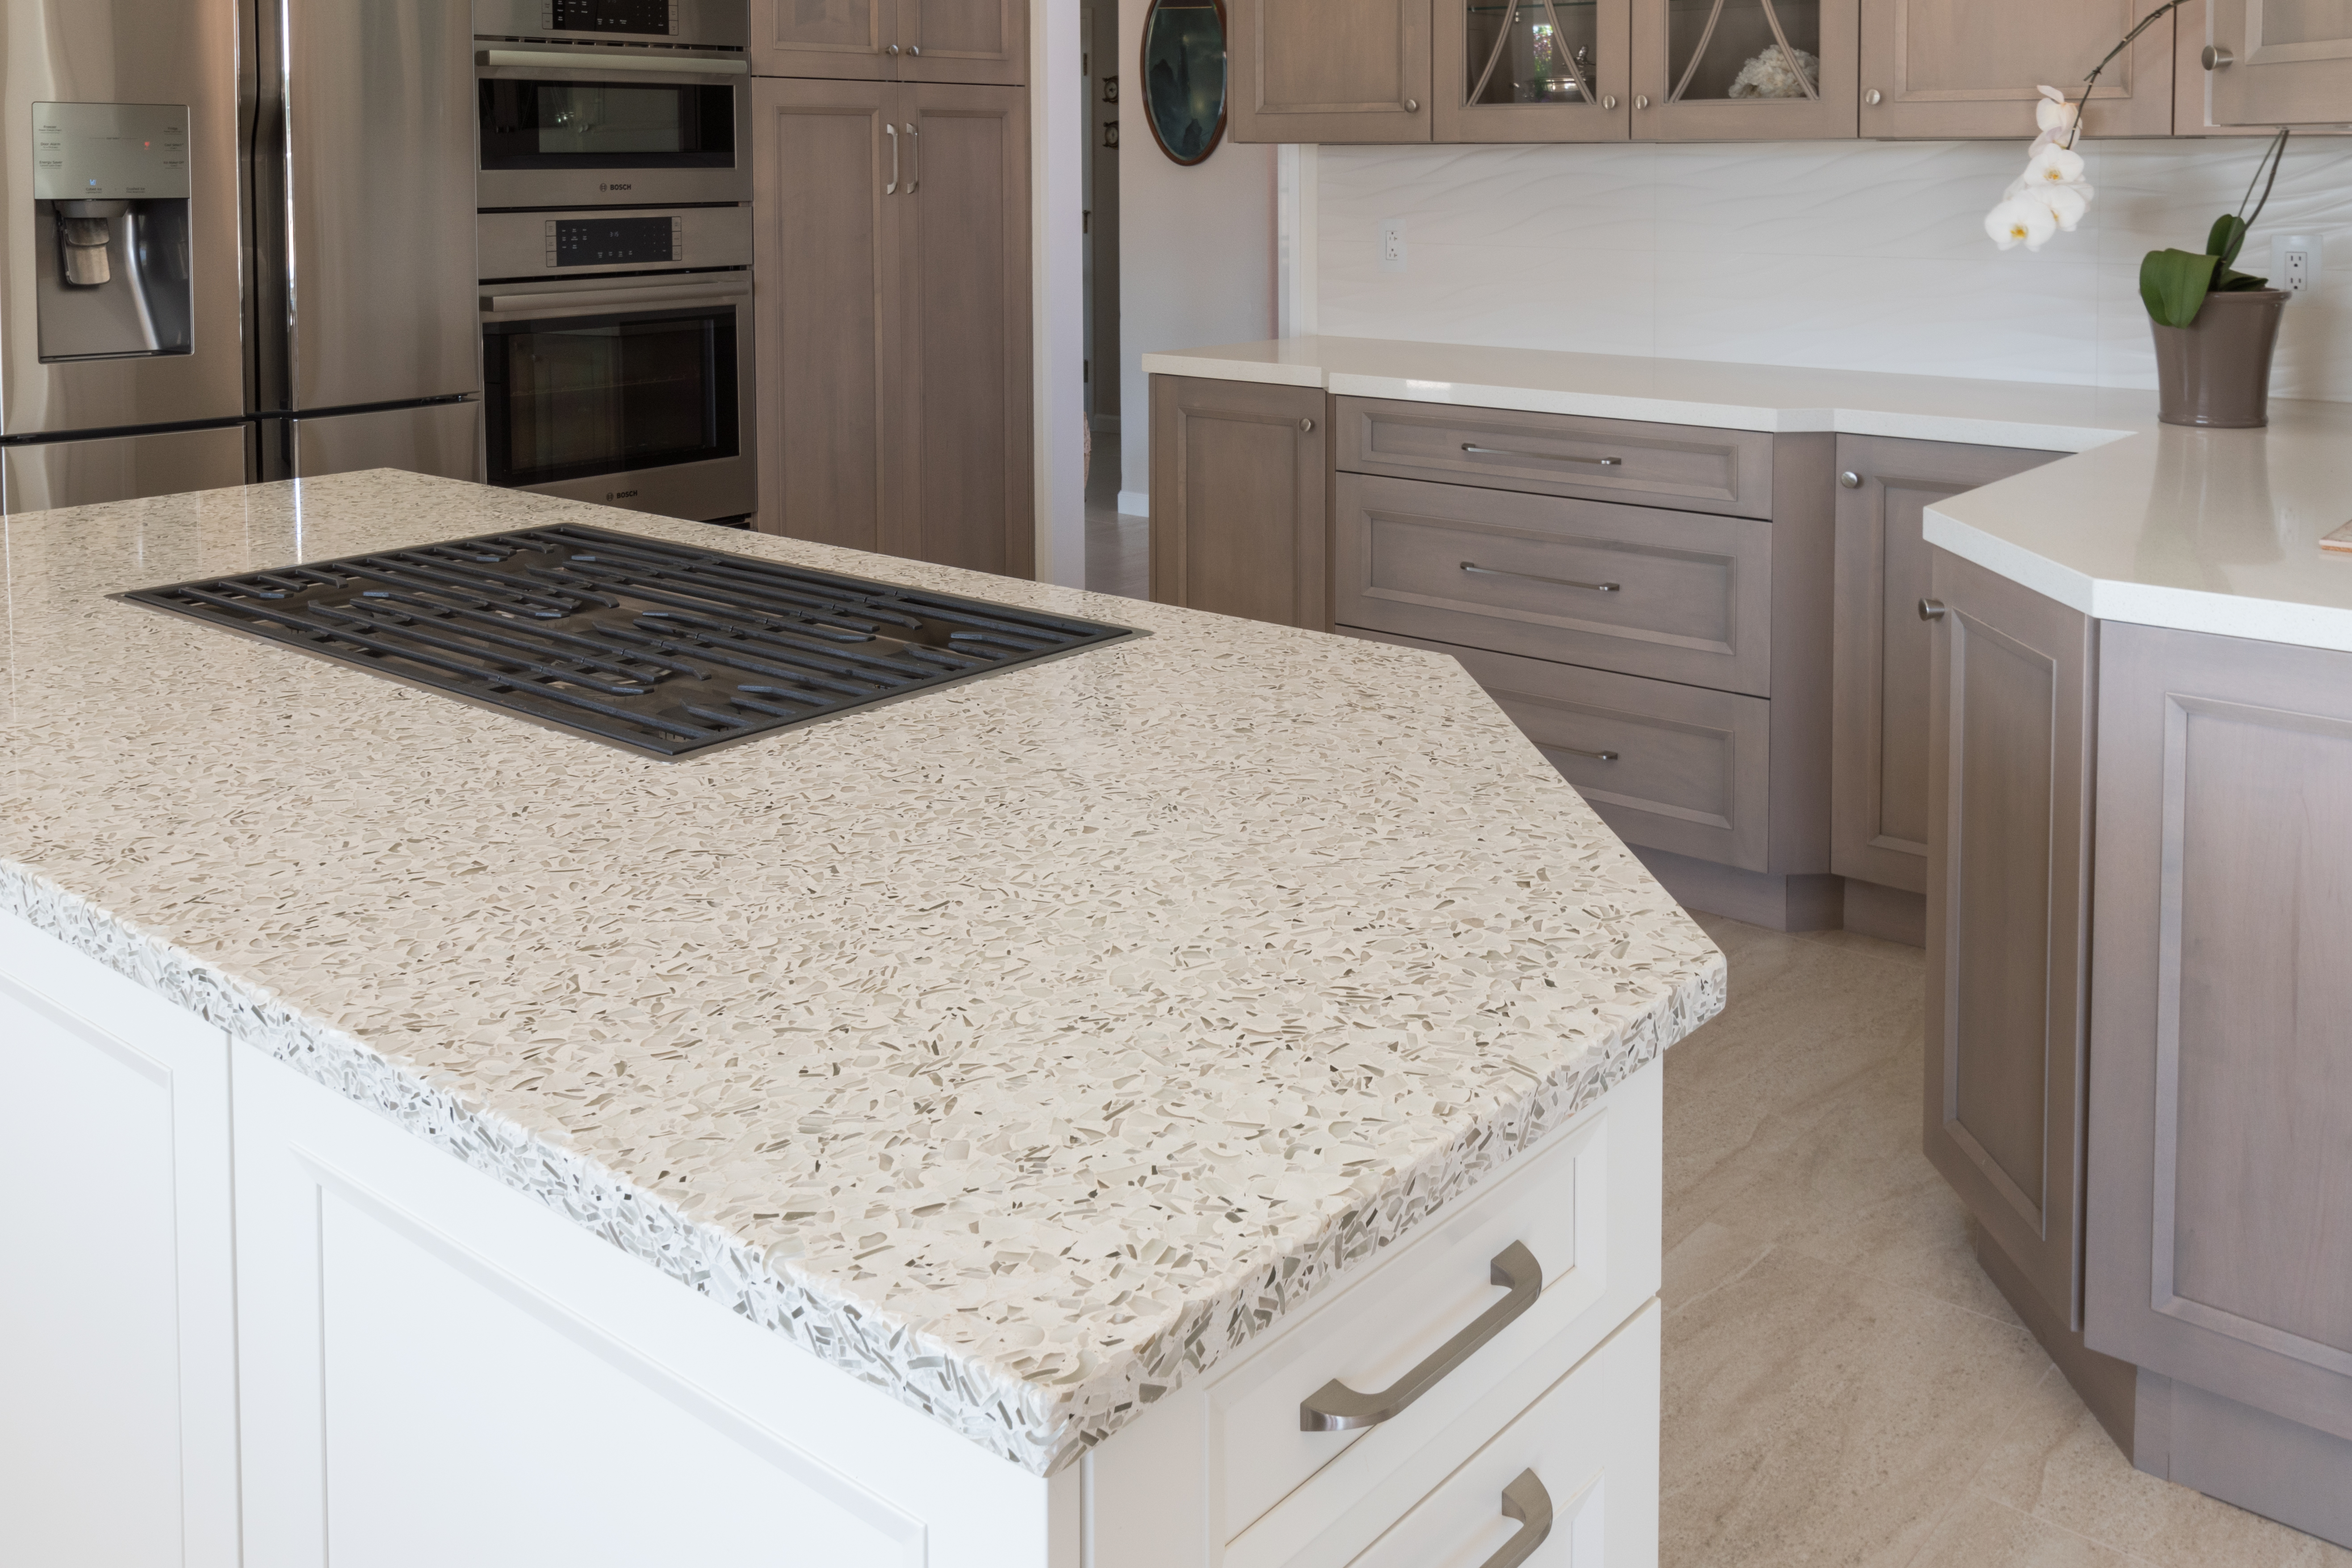 Vetrazzo-san-diego-martini-flint-kitchen-recycled-glass-countertops-pental-quartz-cashmere